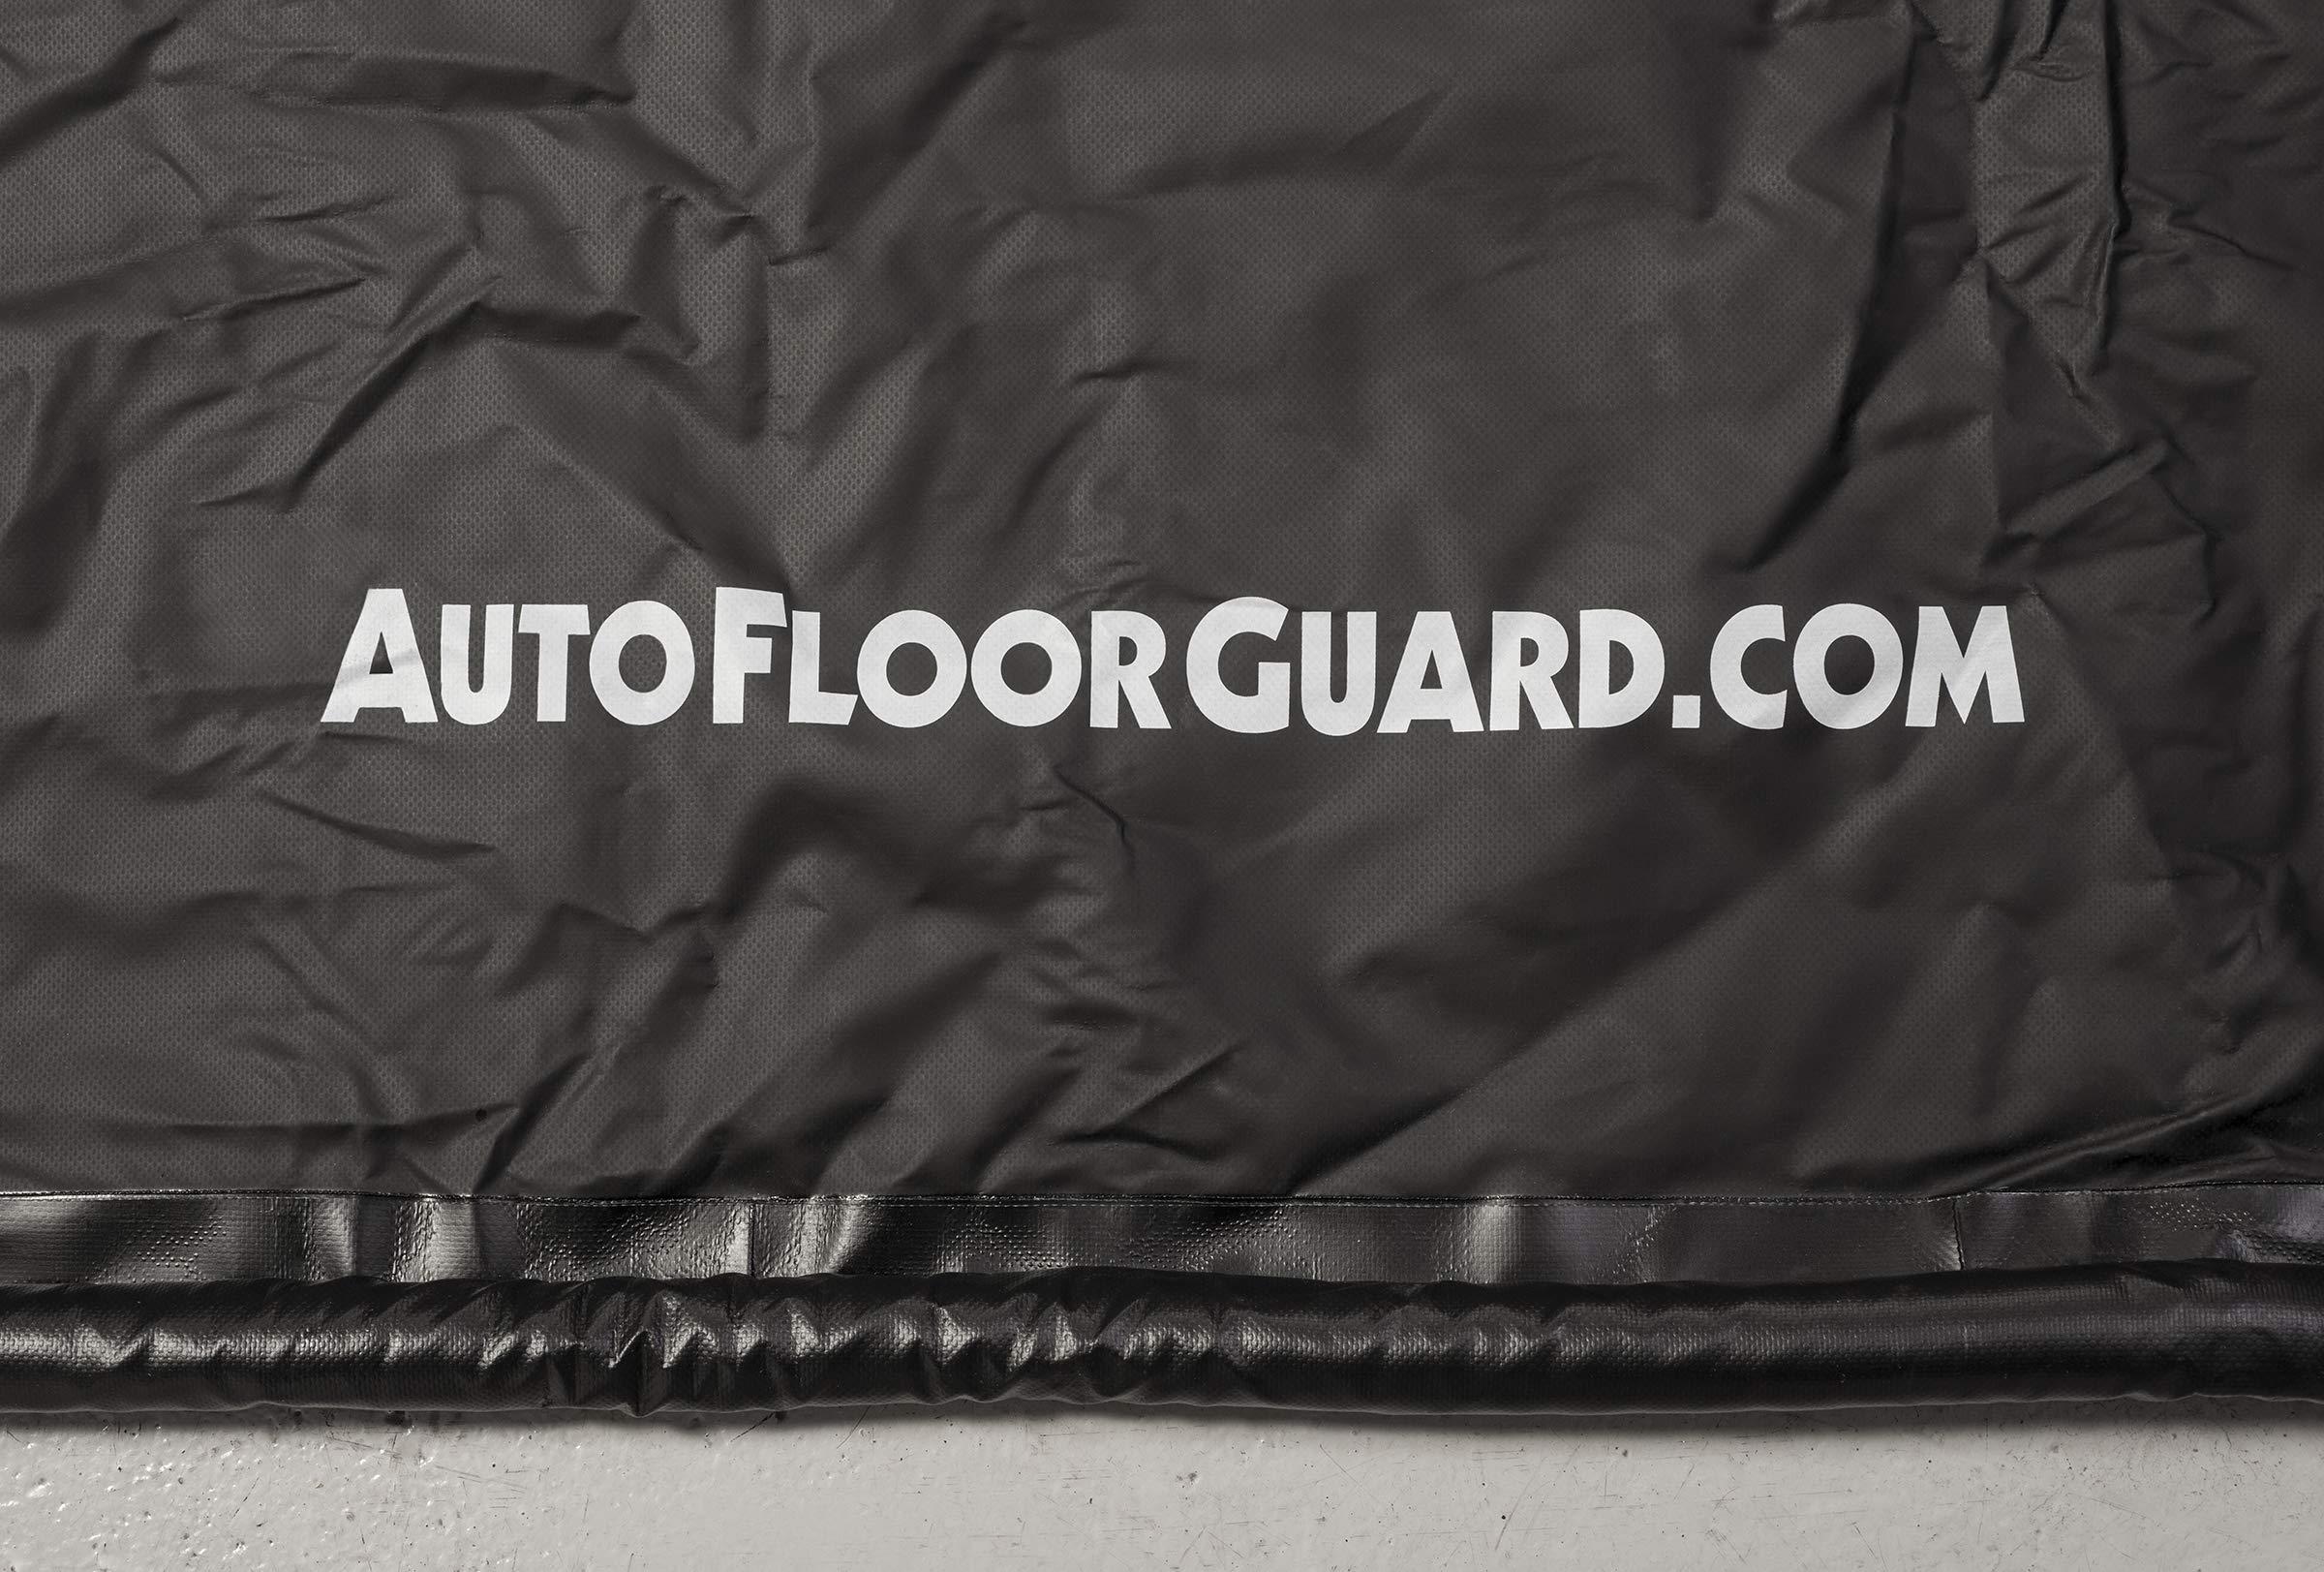 AutoFloorGuard AFGS-7916 Black 7'9'' x 16' AFG Compact Size Containment mat by AutoFloorGuard (Image #1)